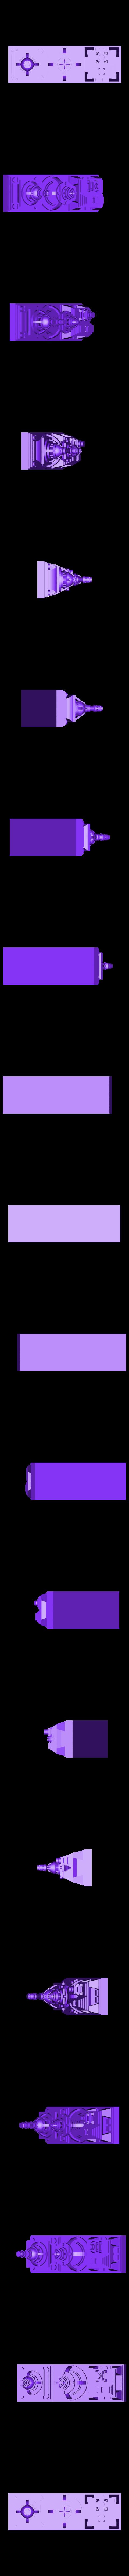 tetris_cities_triple.stl Download free STL file Tetris Heart Puzzle • Design to 3D print, ferjerez3d